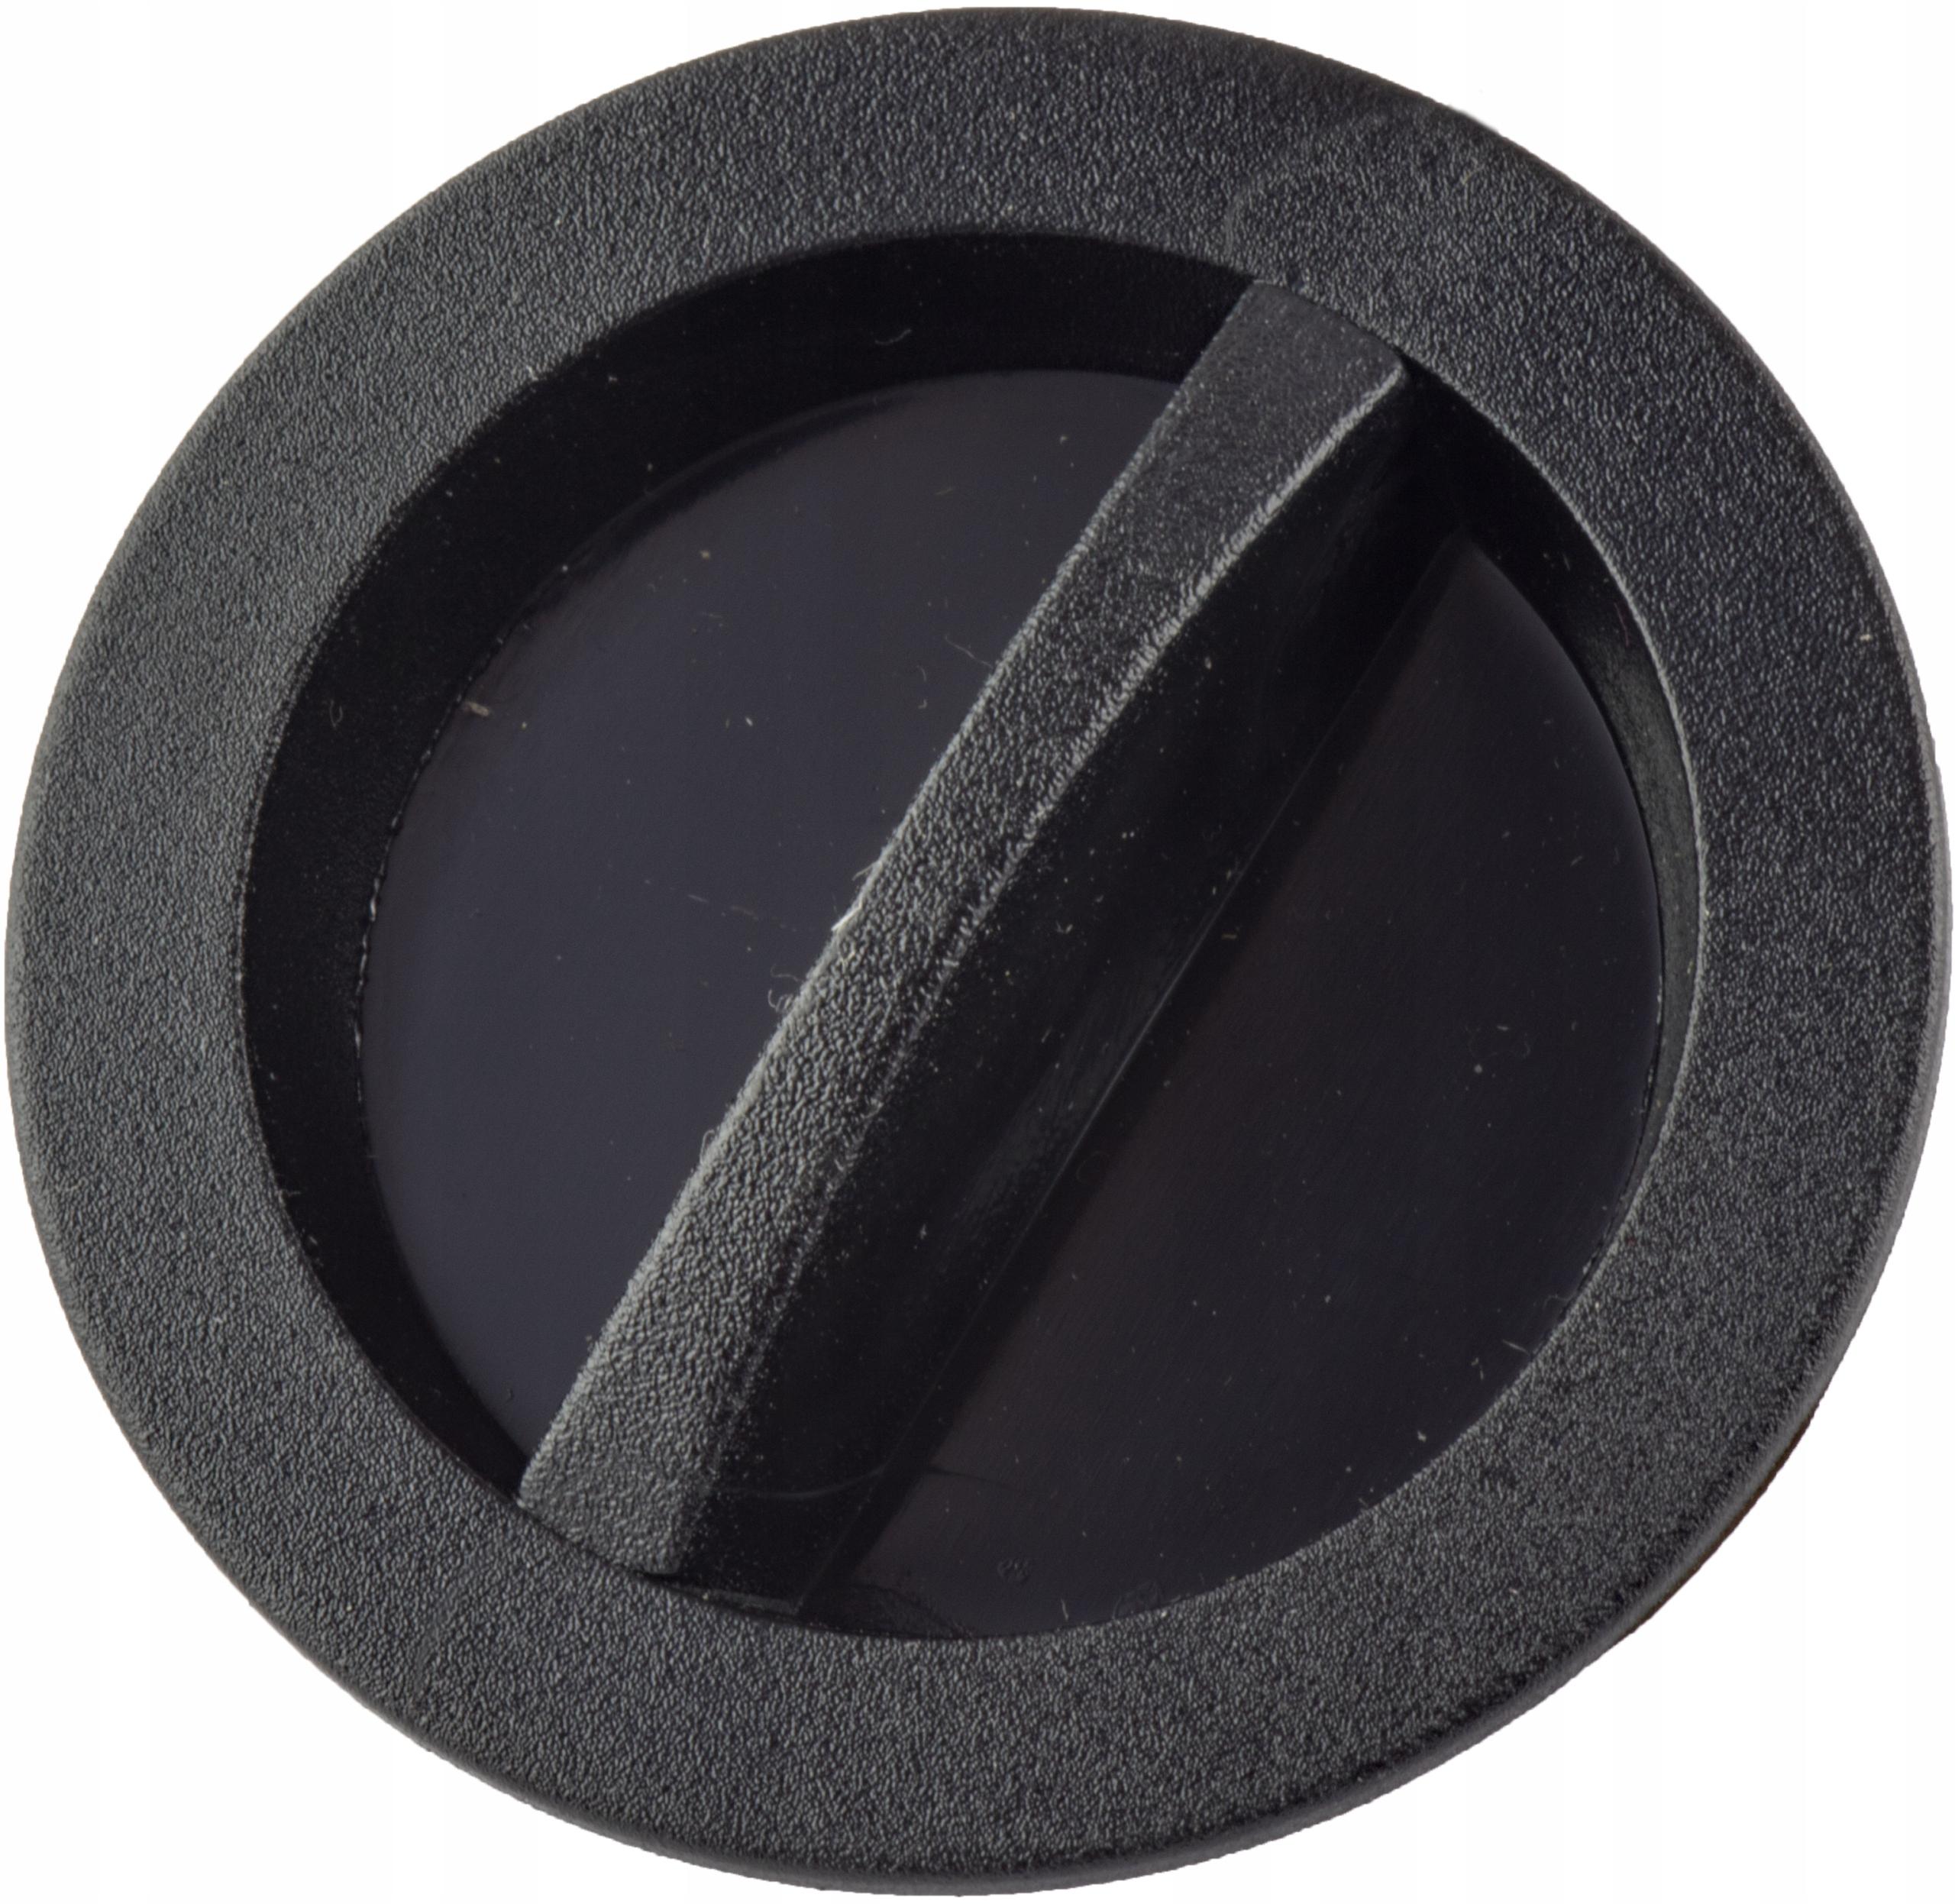 пробка к настой газа заглушка заглушка снг 8mm m8